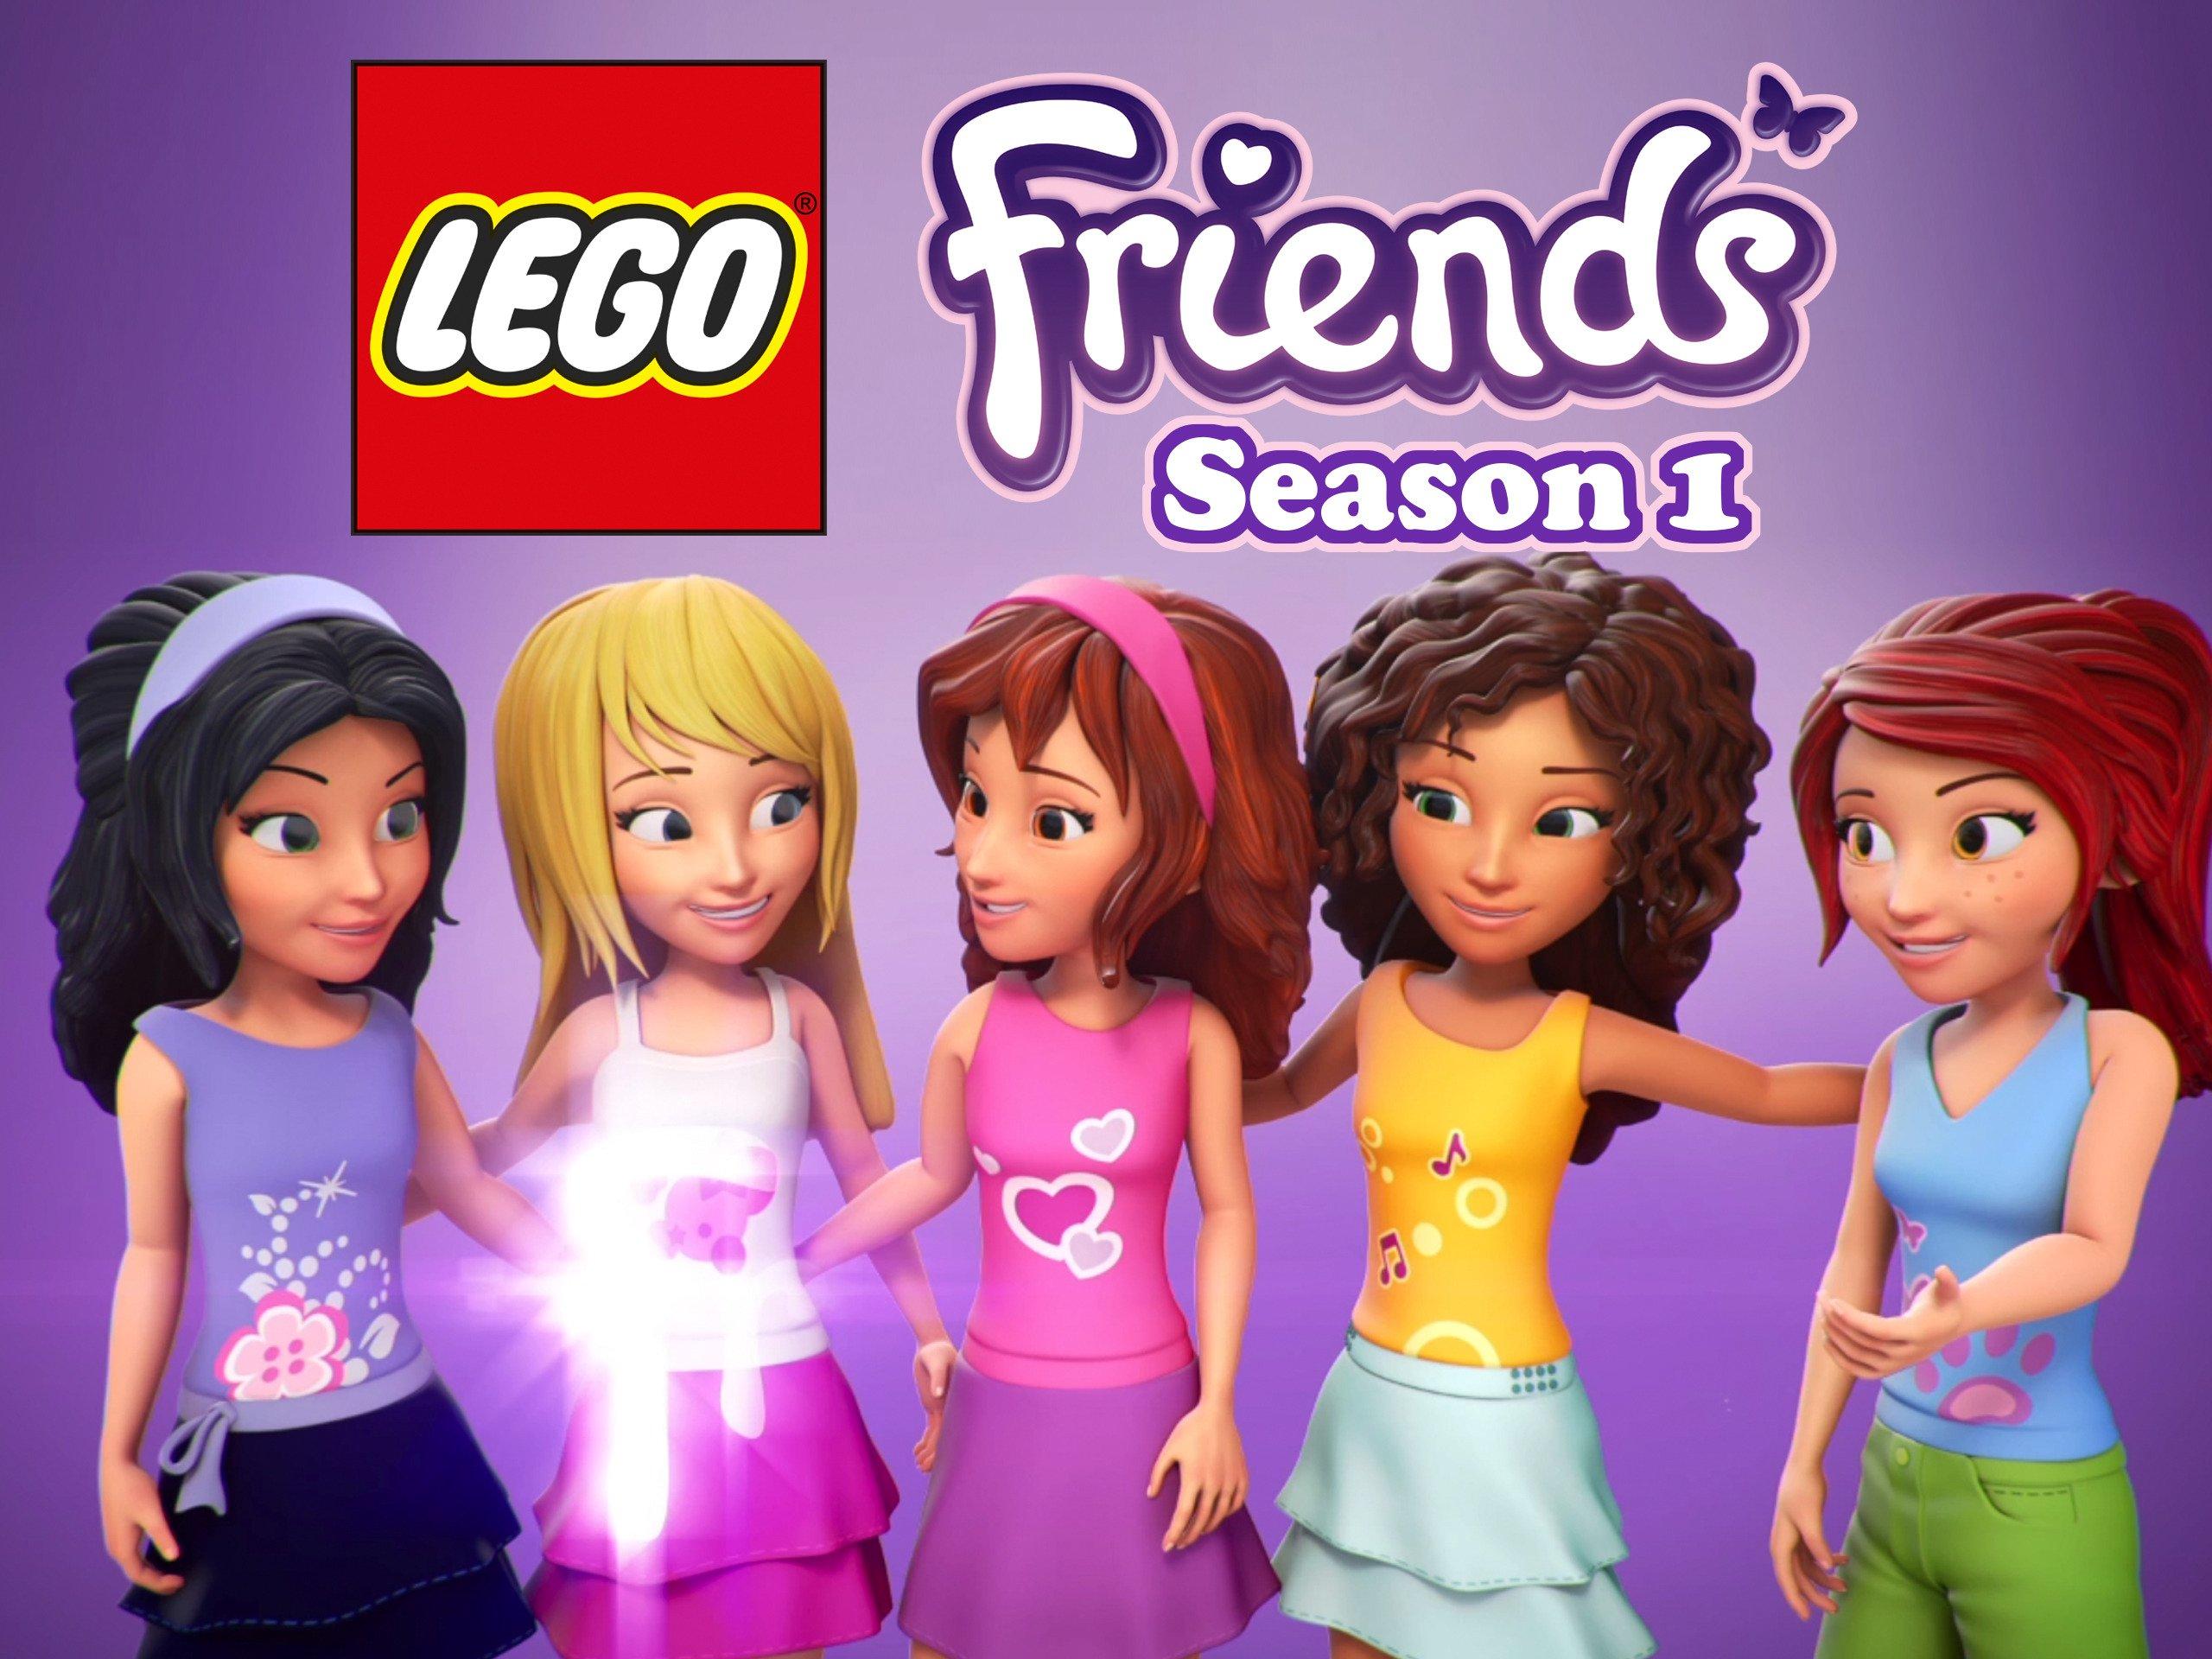 Amazoncouk Watch Lego Friends Season 1 Prime Video